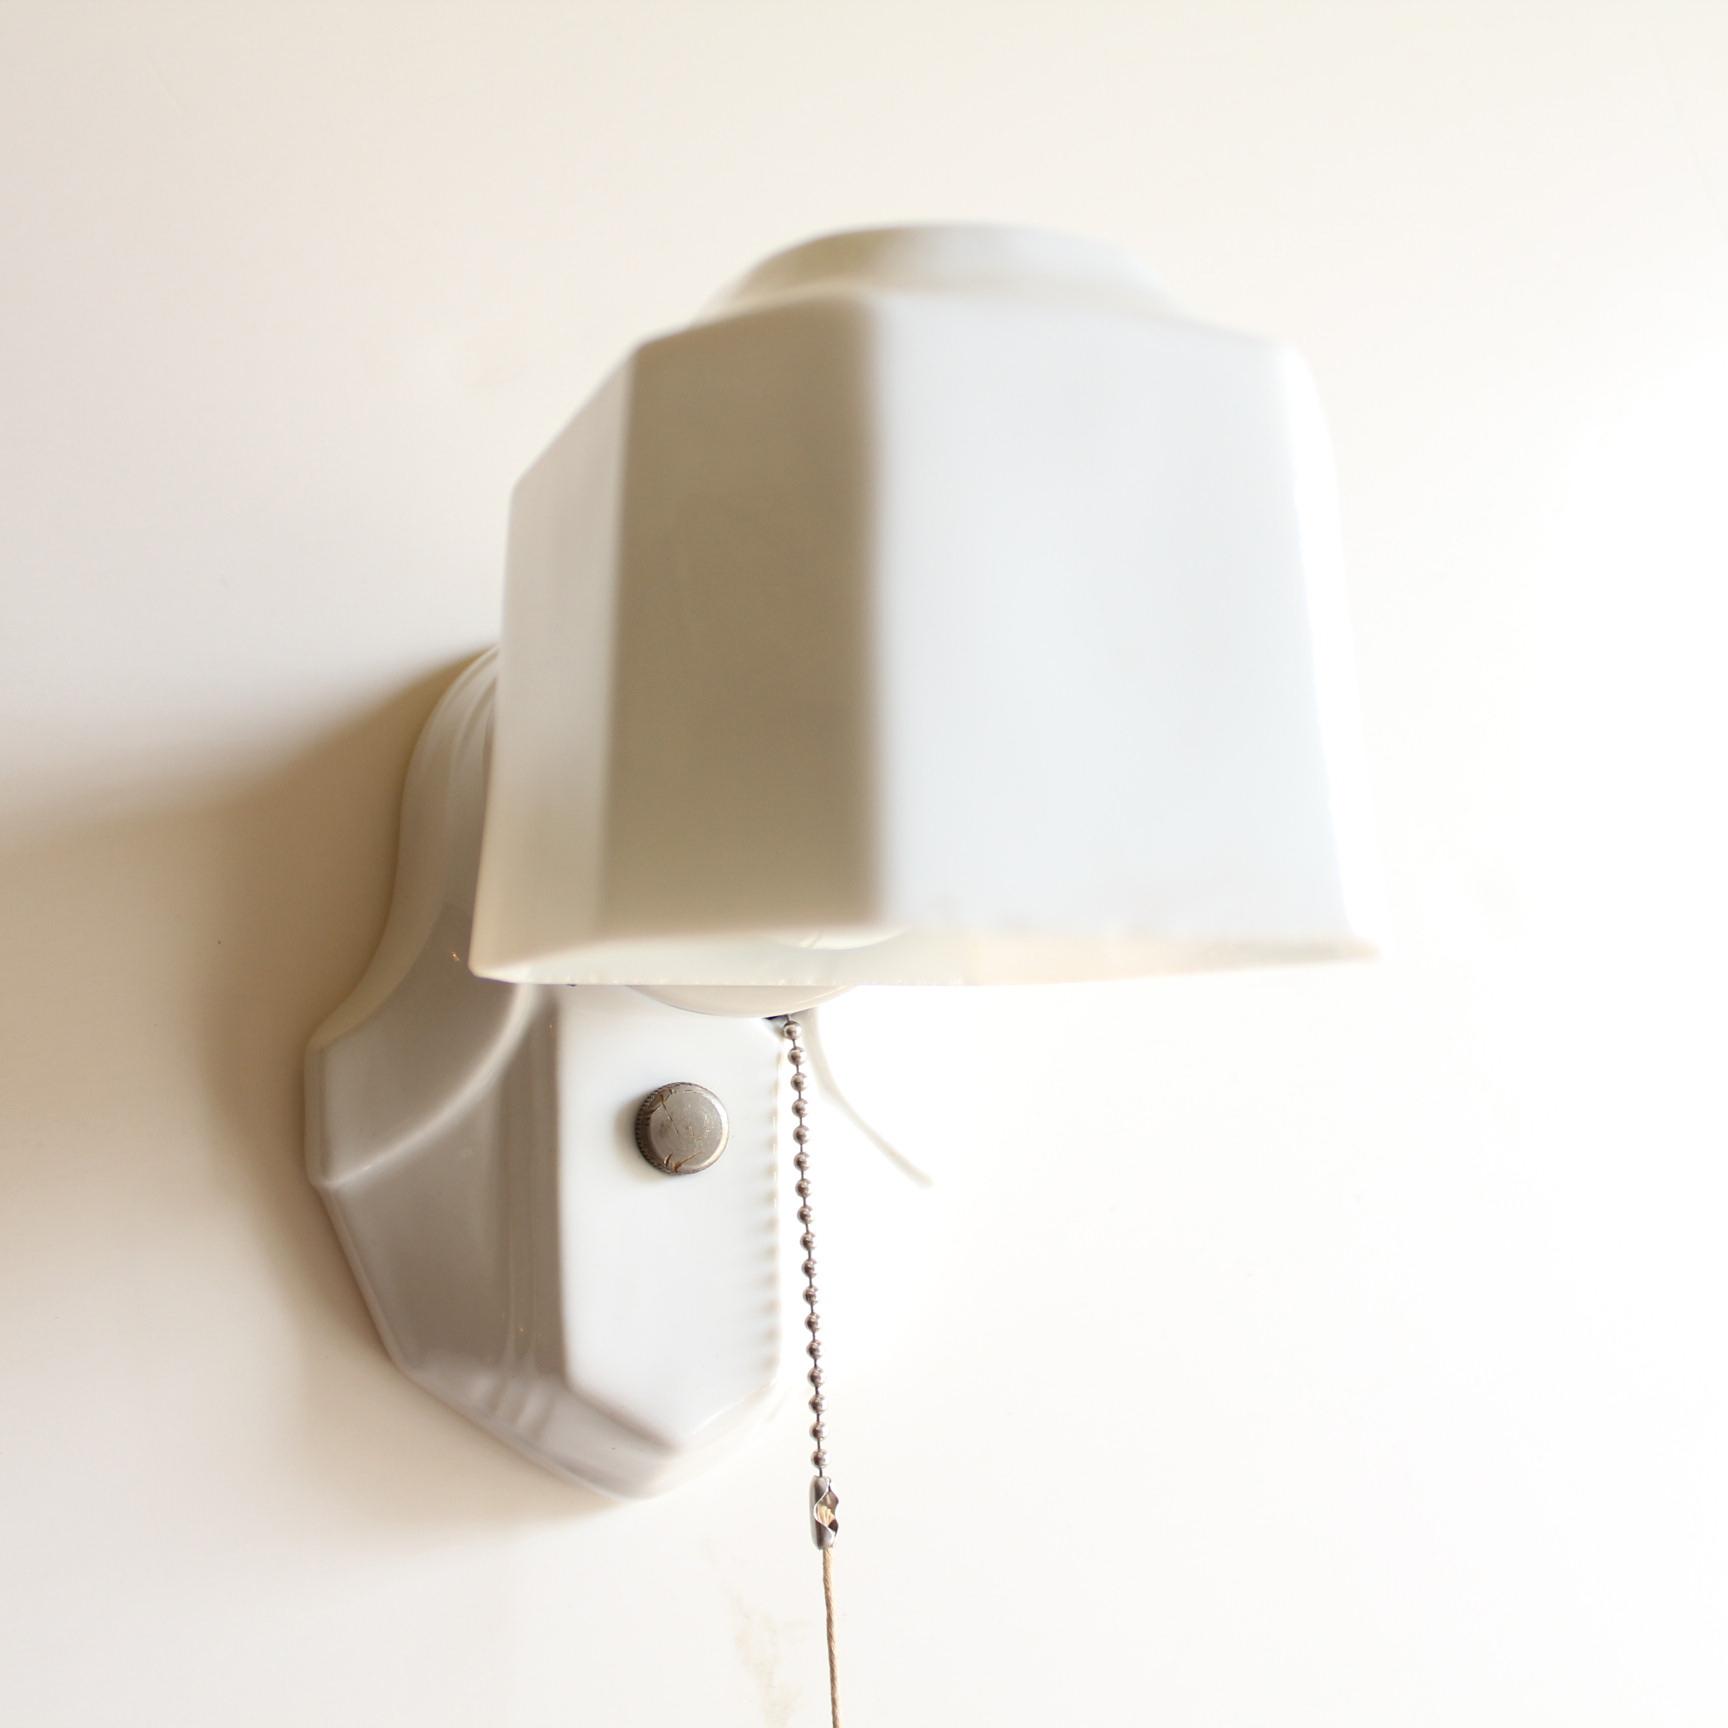 ANTIQUE WALL LAMP GLASS SHADE ENAMEL BASE